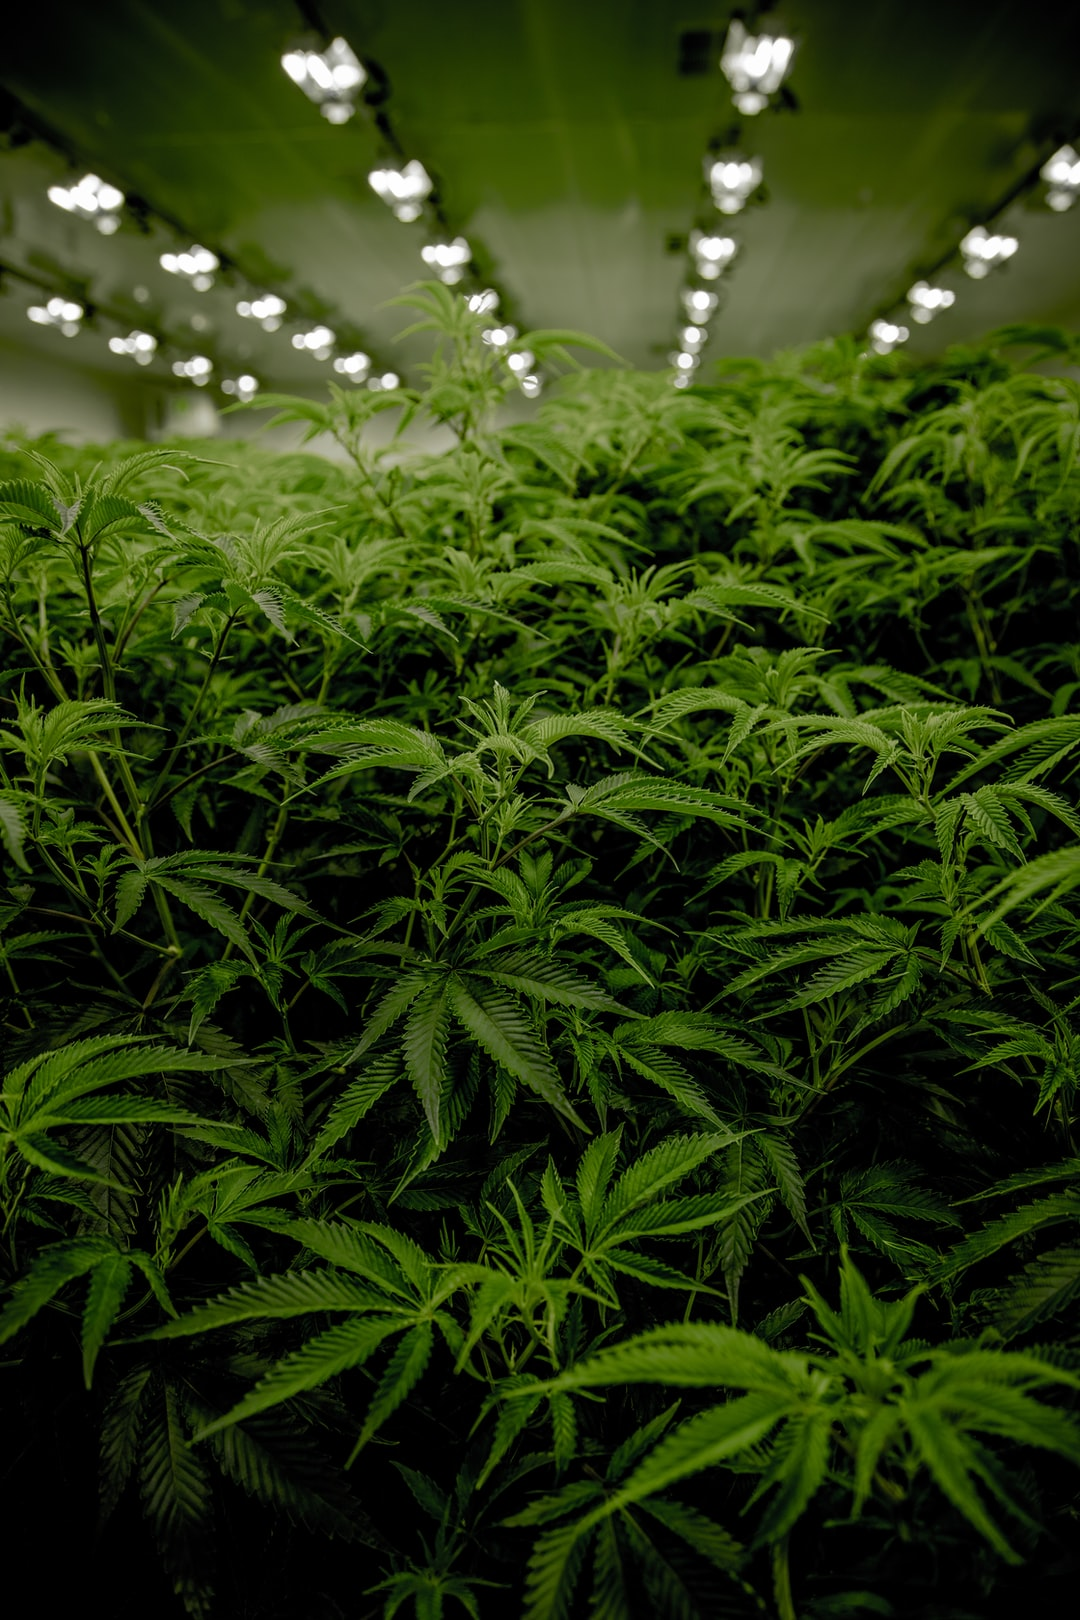 Next Green Wave Cannabis plants in California